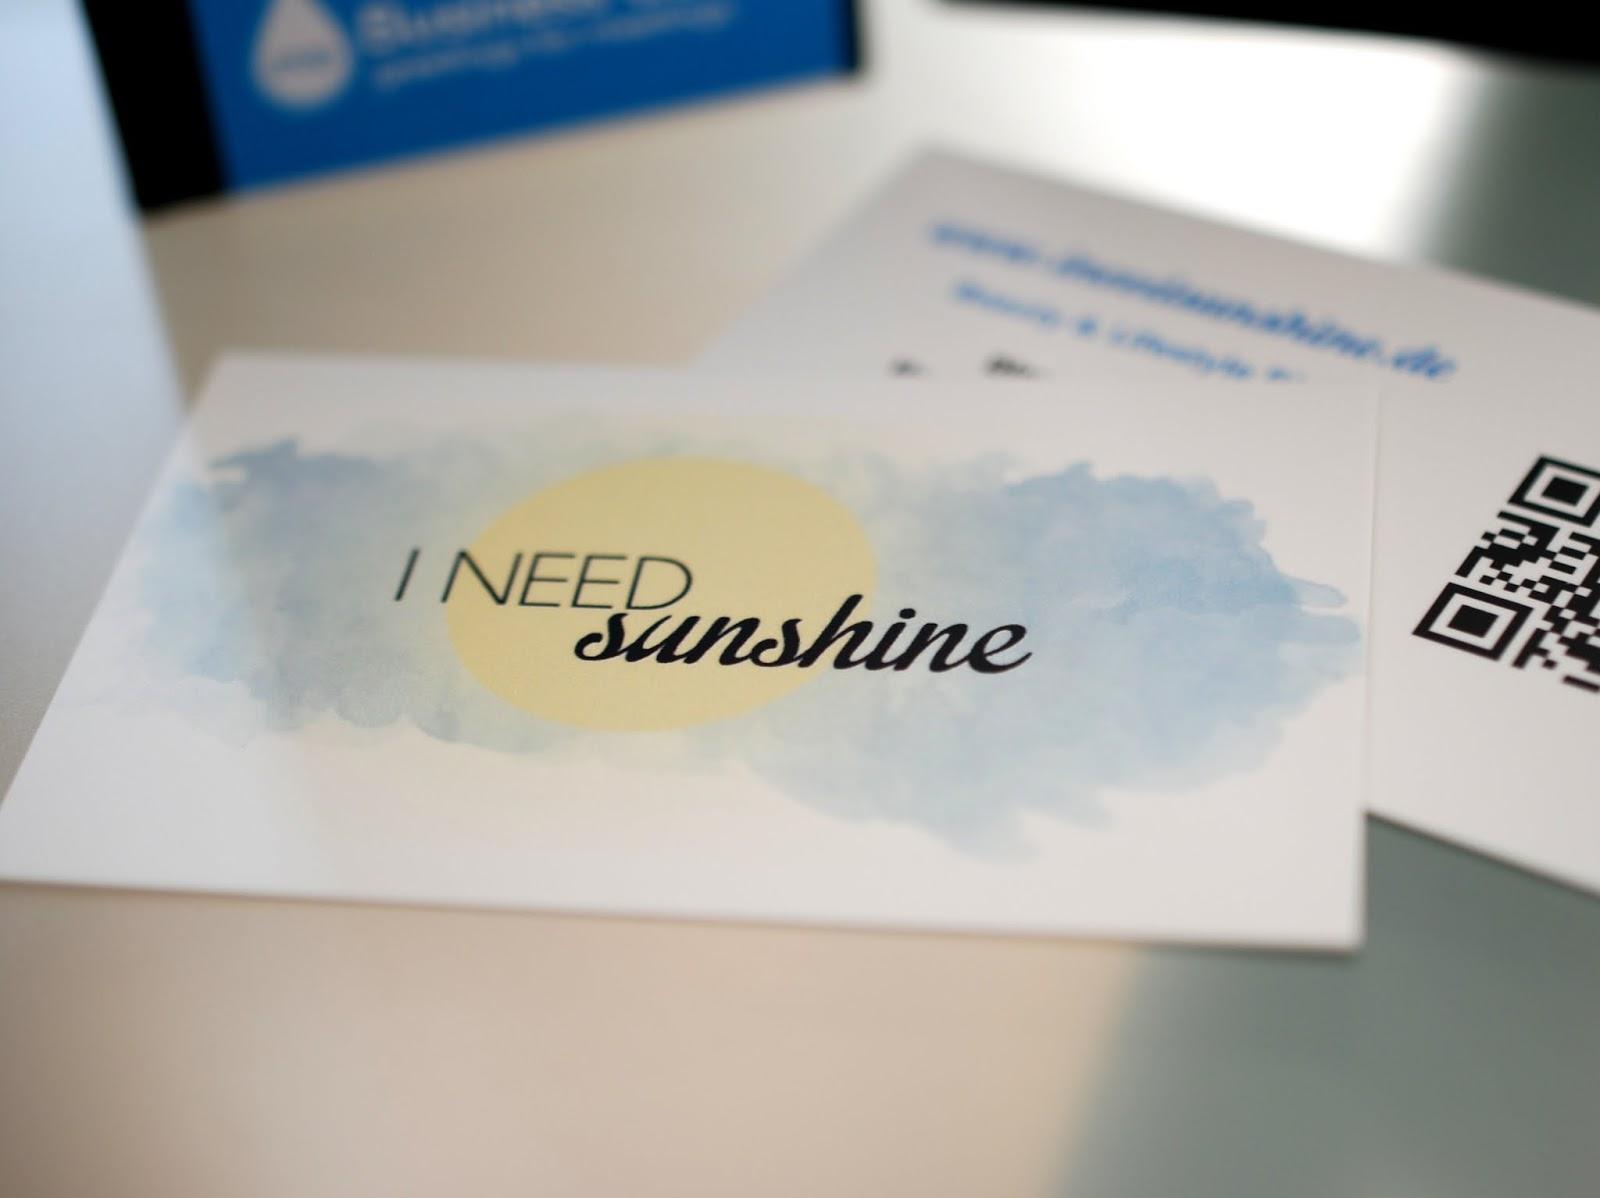 Braucht man als Blogger Visitenkarten